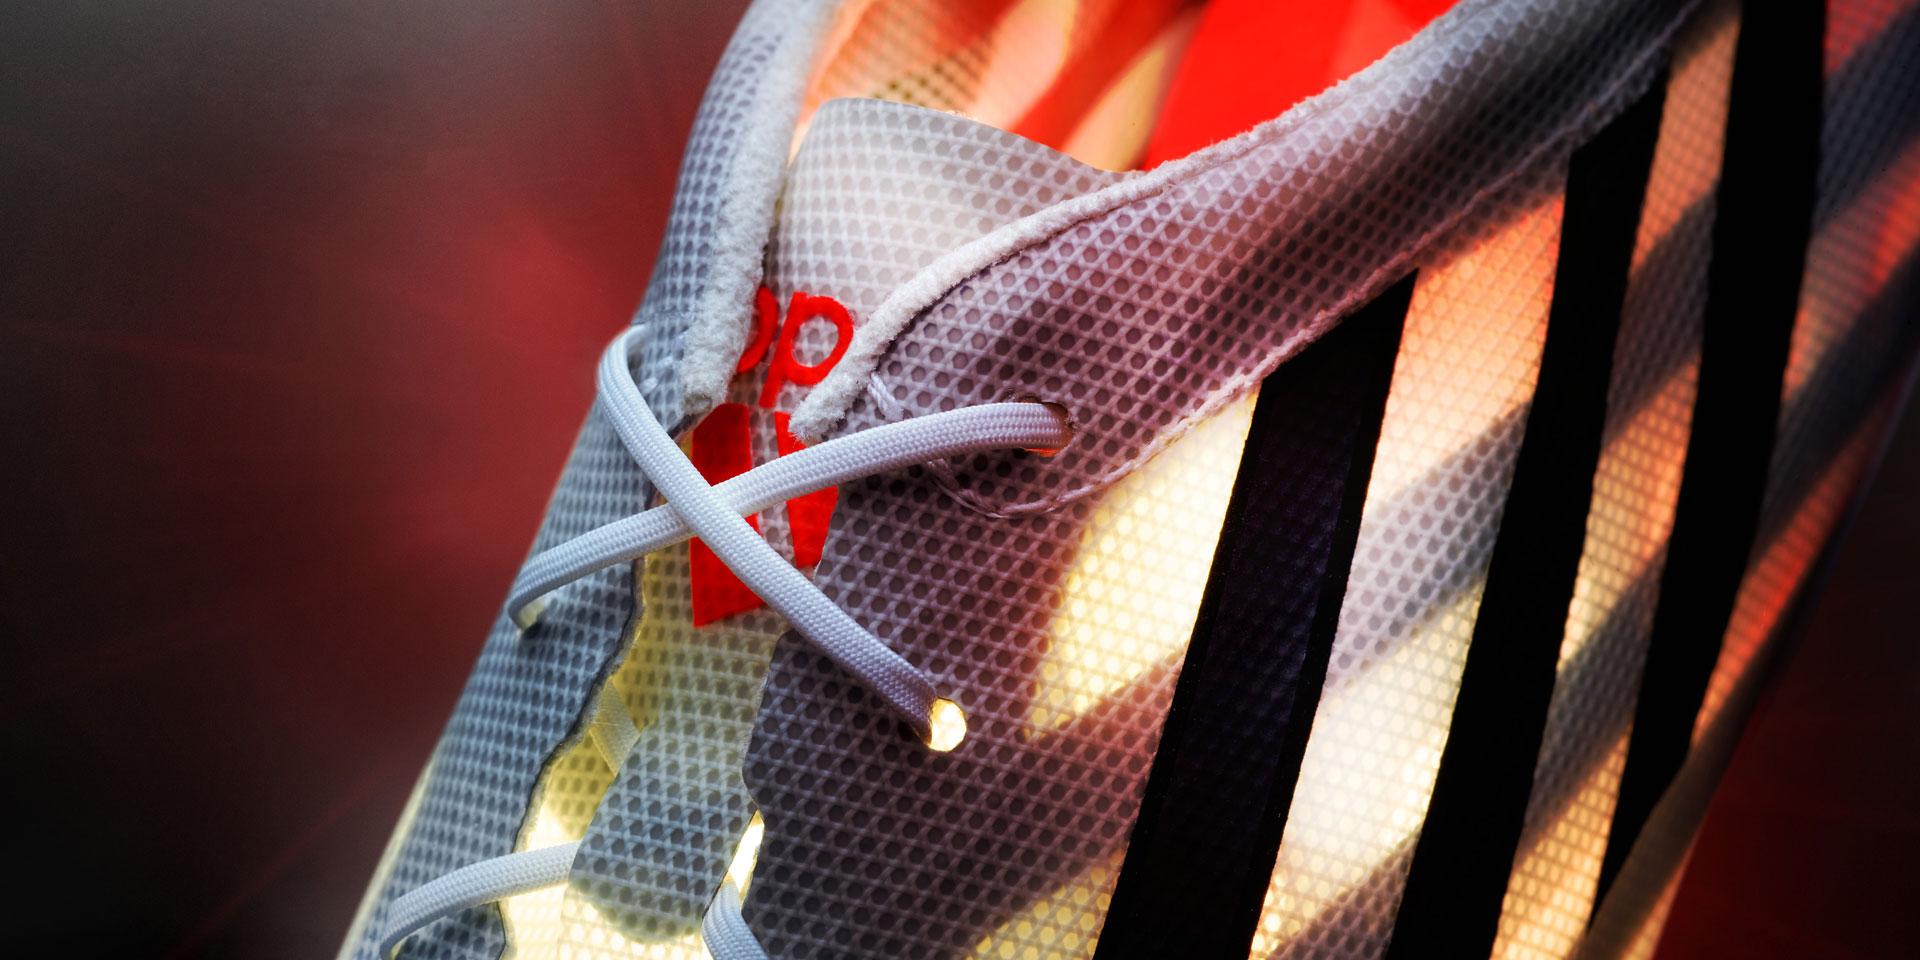 Adidas adizero 99g - Woven Mesh Material